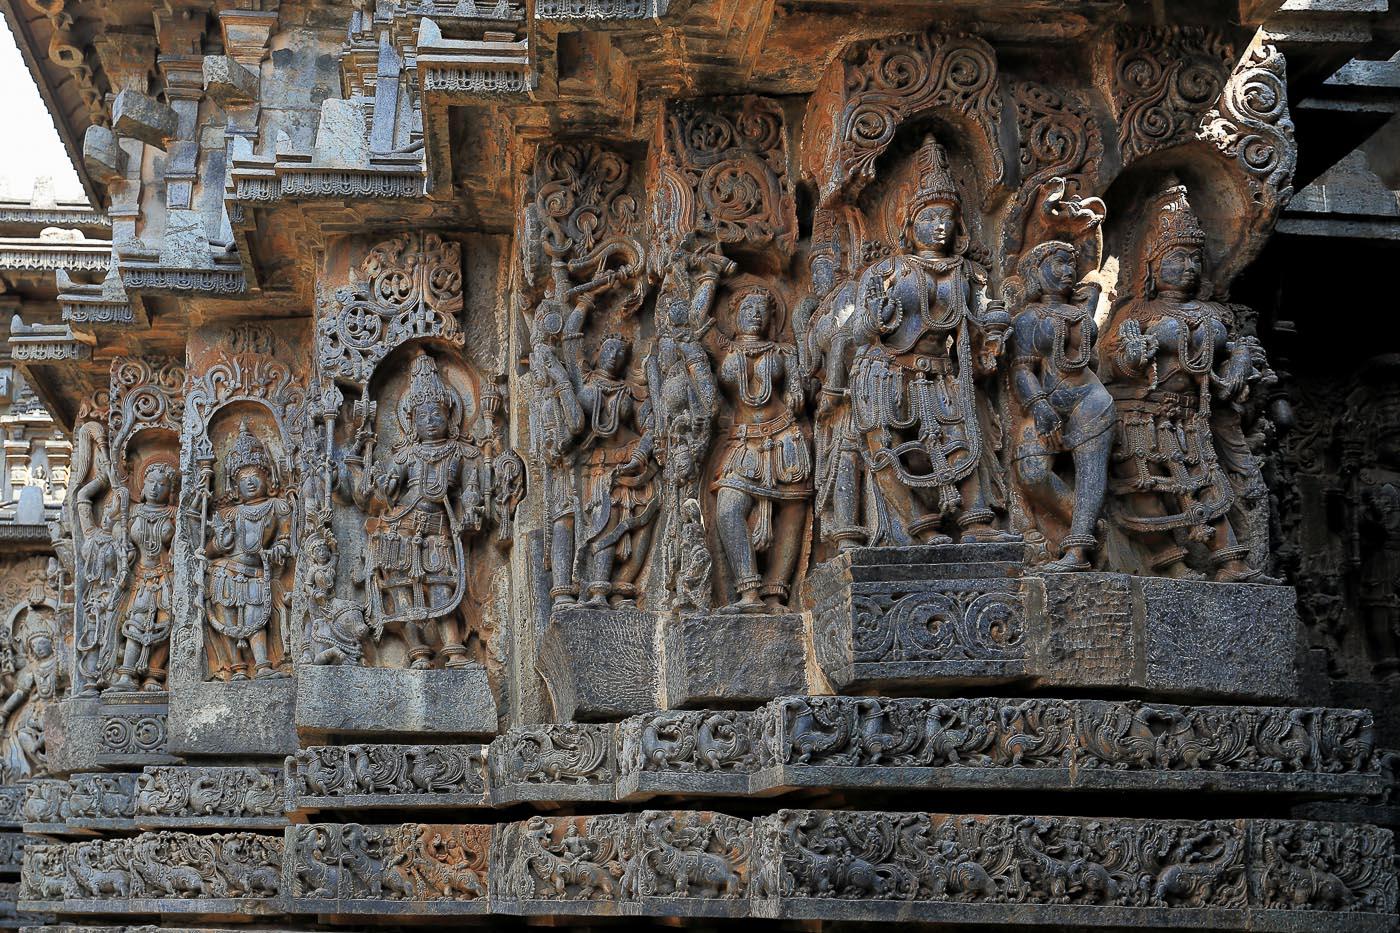 Фото №6. Храм Хойсалешвара, барельефы. 1/30, -1 eV, f 6.3, 31 mm, ISO 200